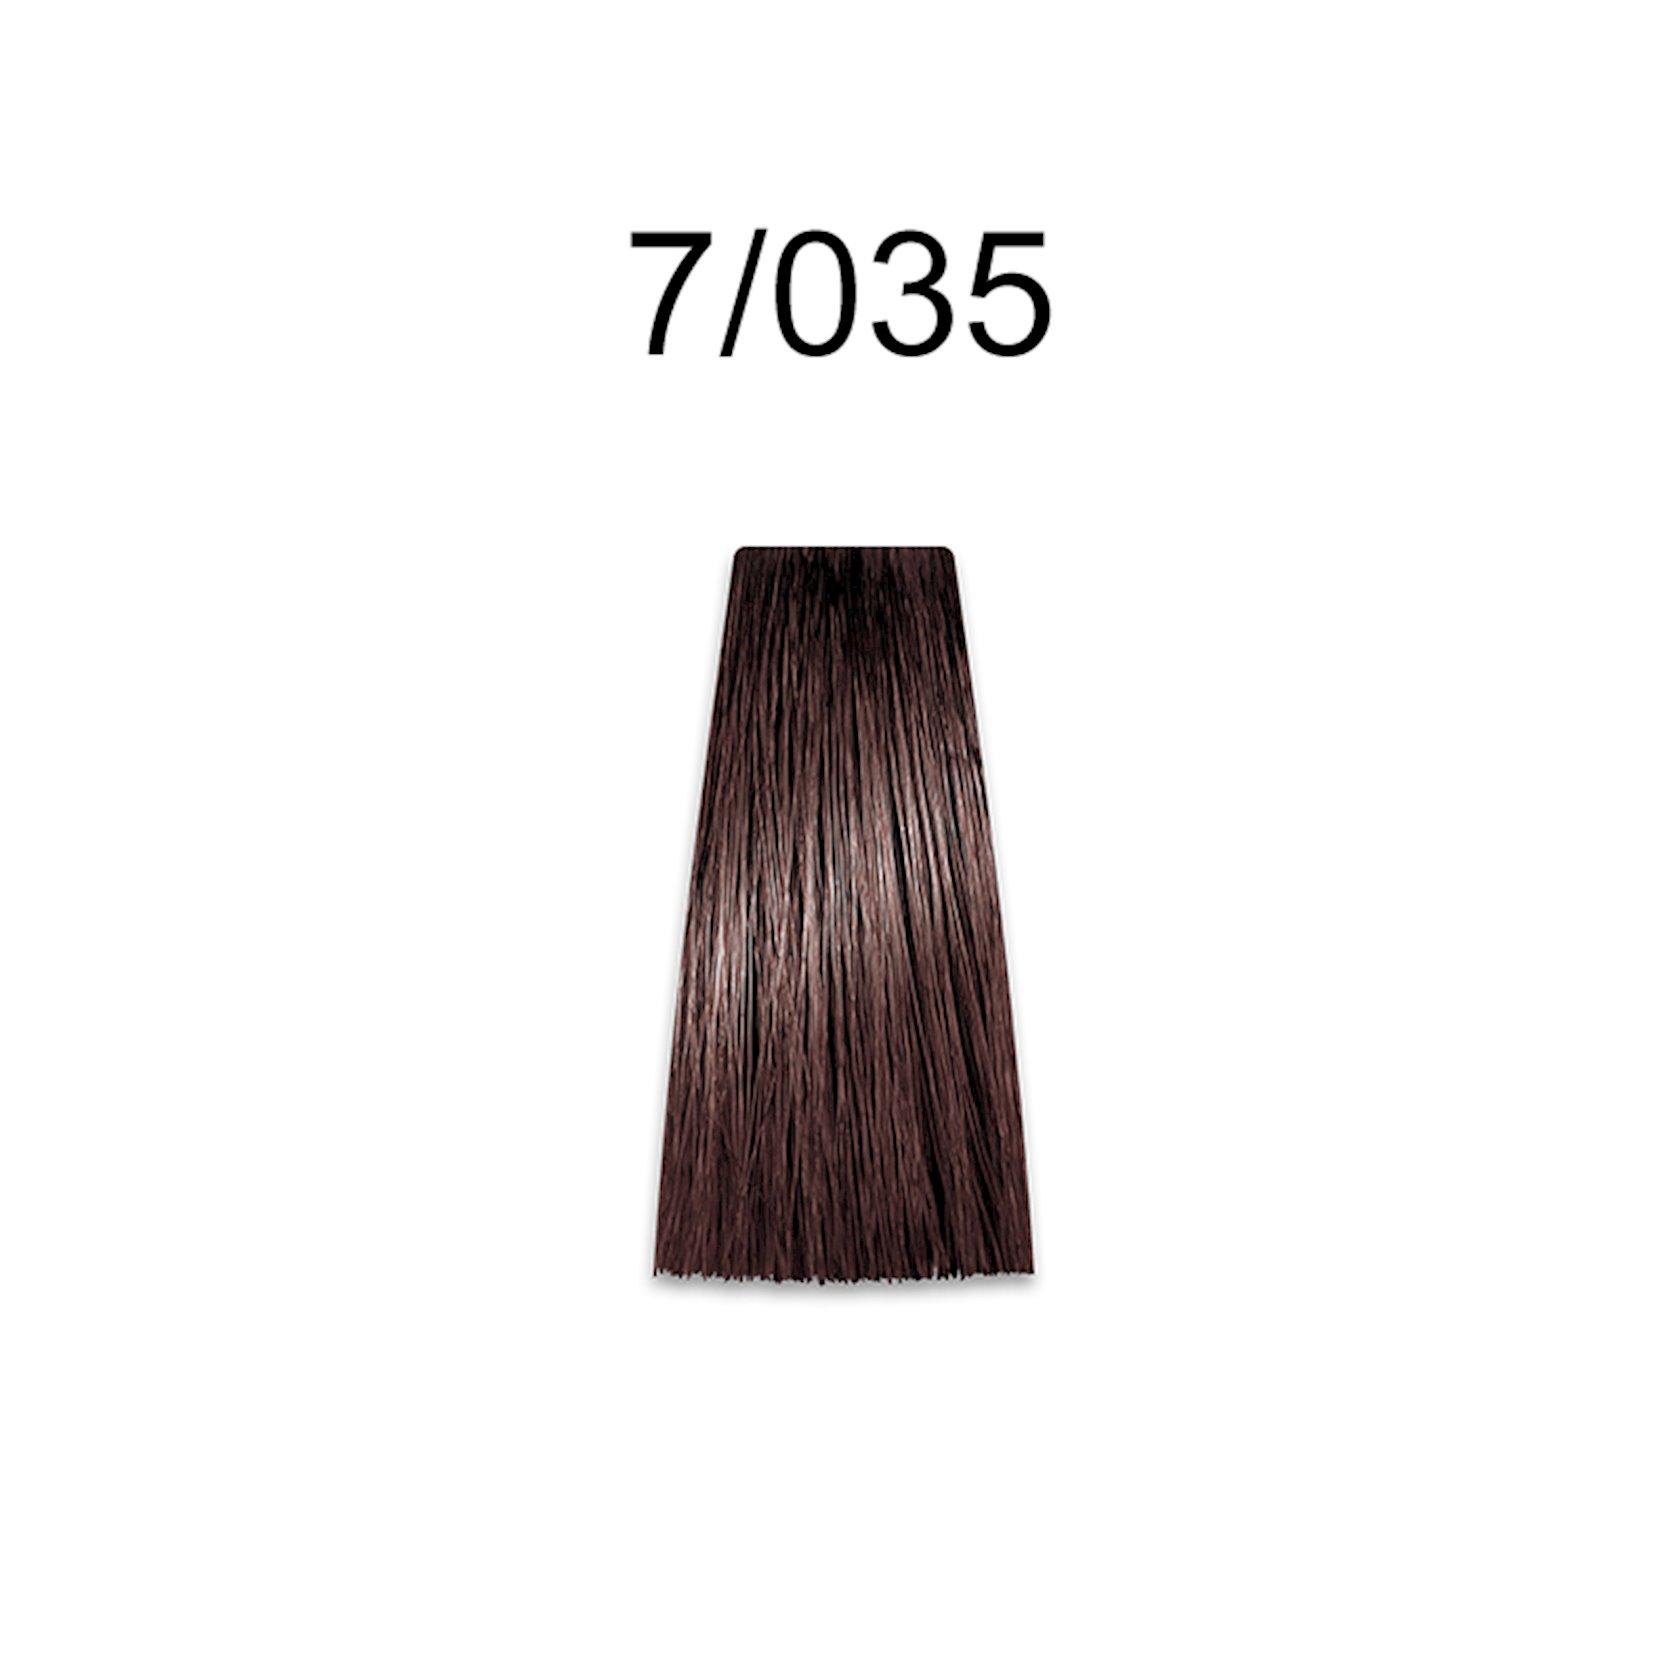 Saçlar üçün krem-boya Prosalon Professional Intensis Color Art № 7-035 golden nut blond 100 ml